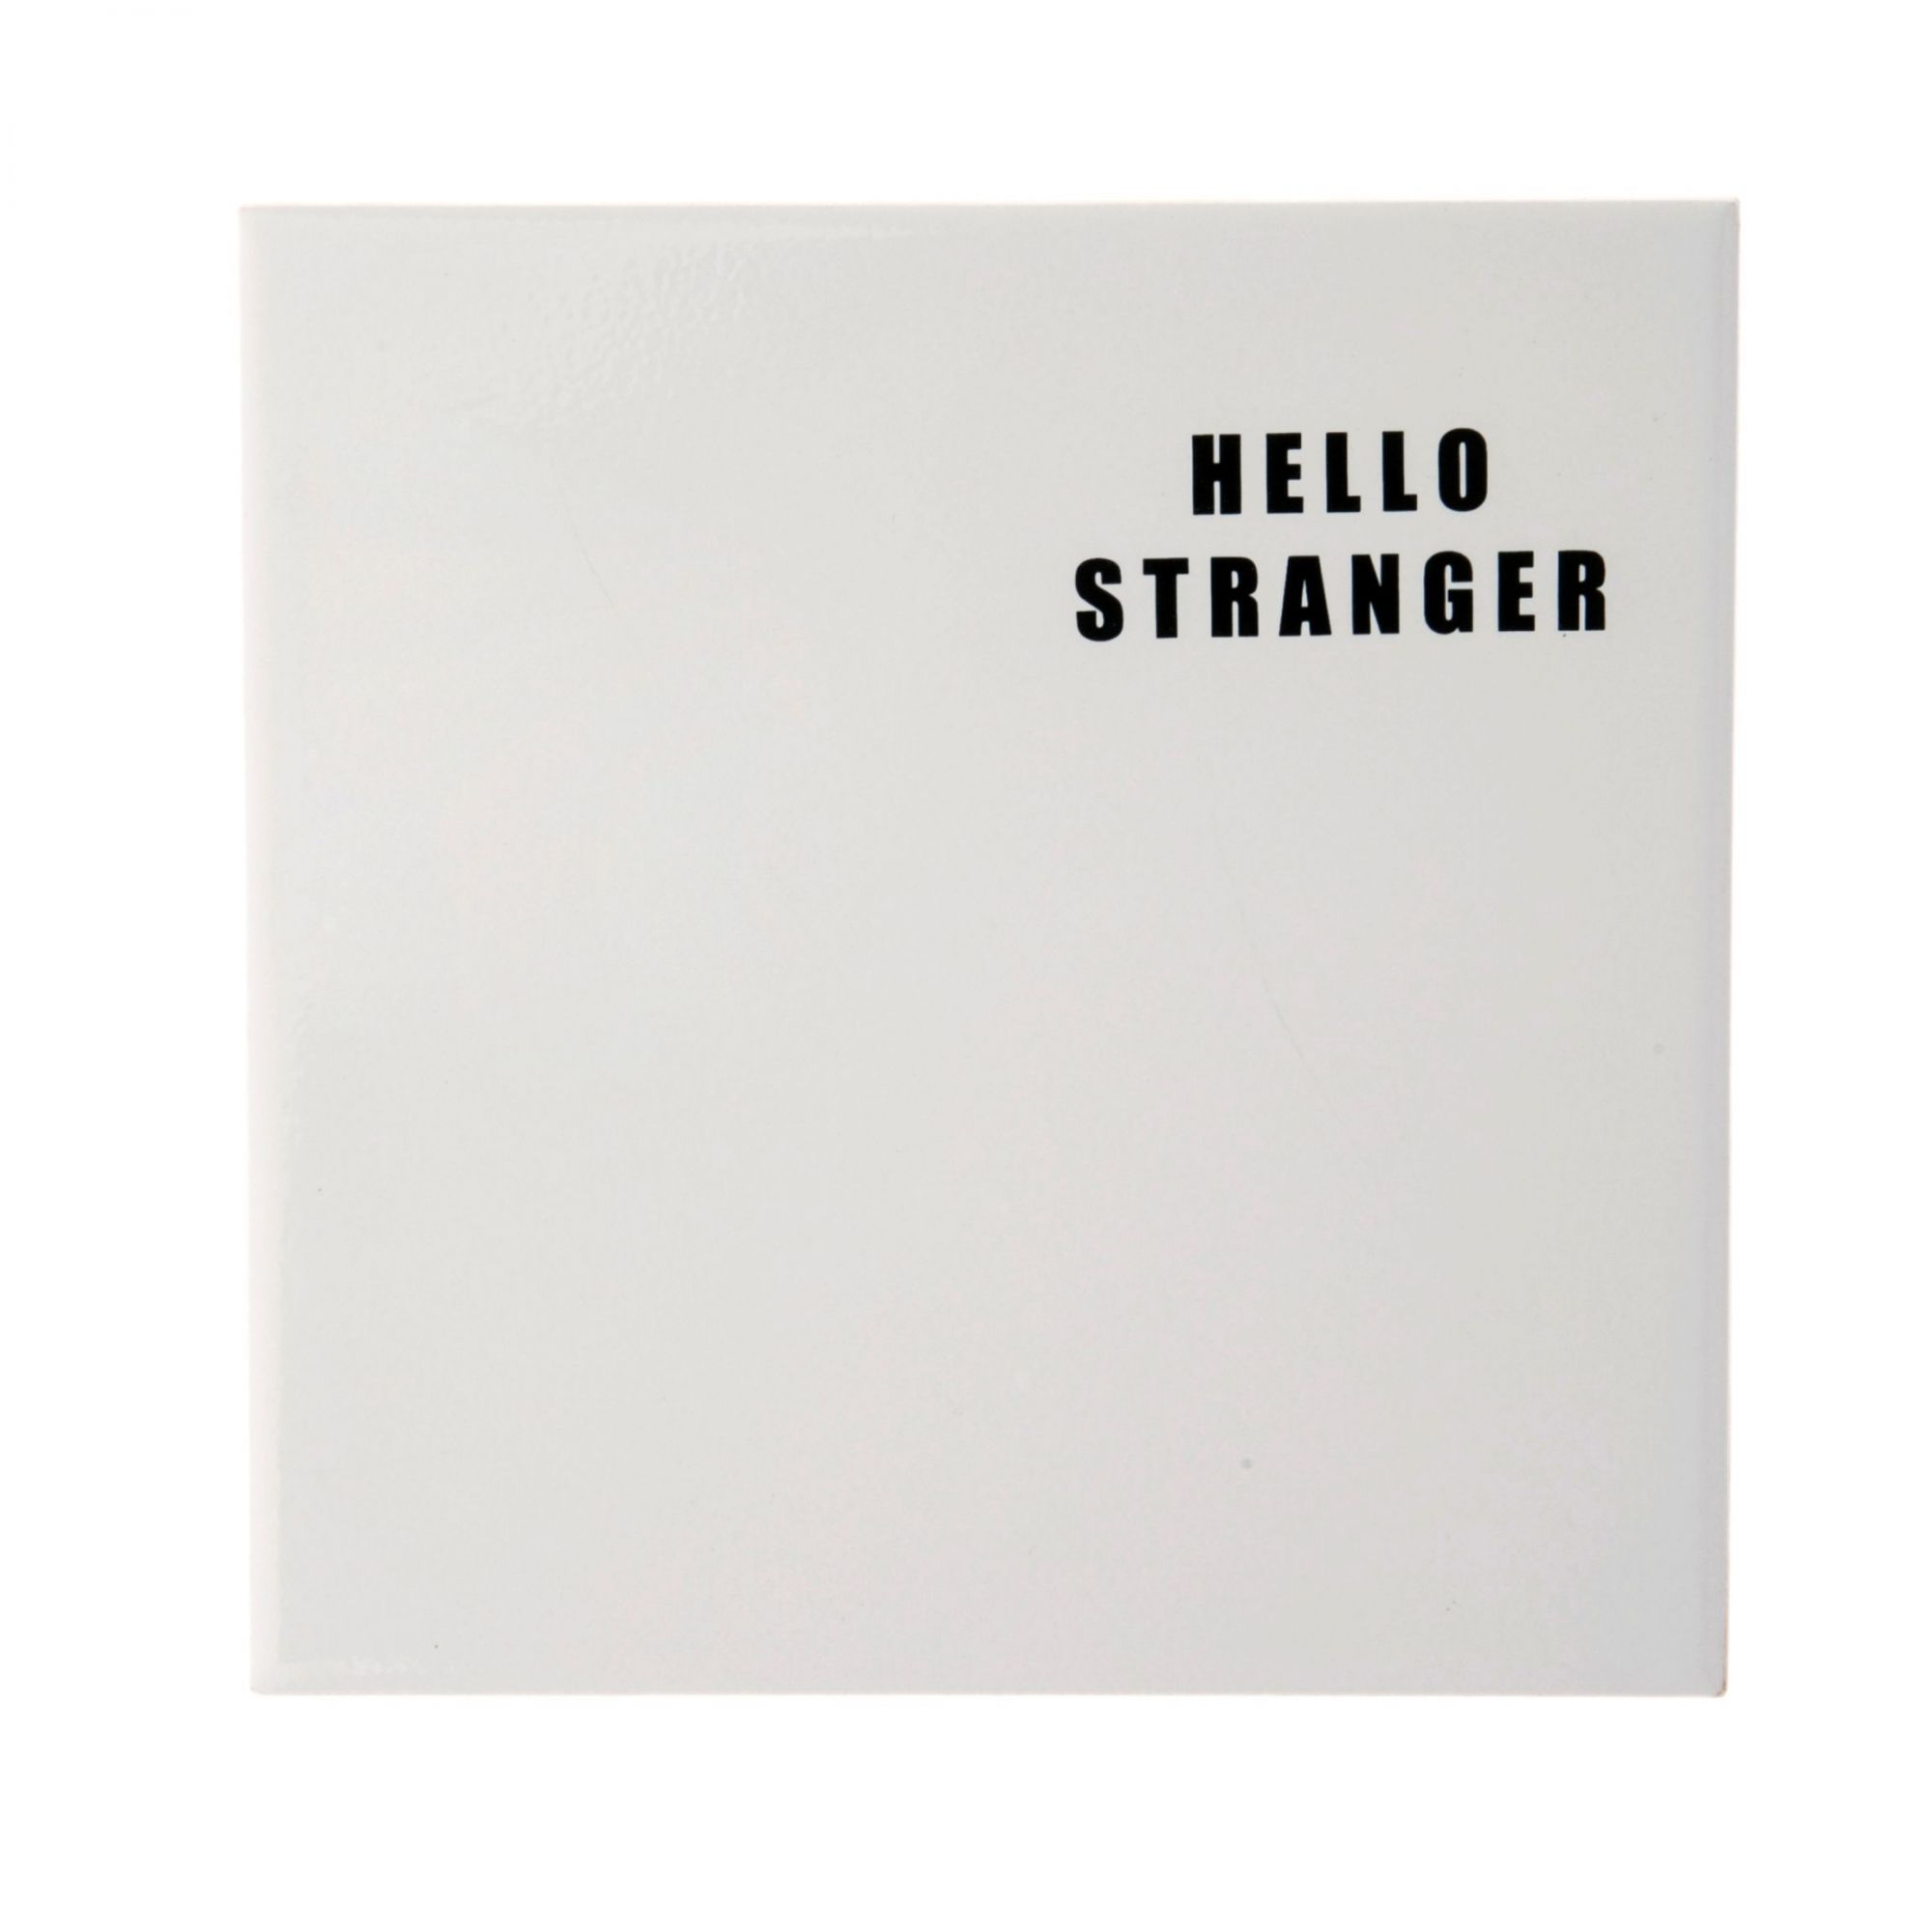 Azulejo Hello Stranger